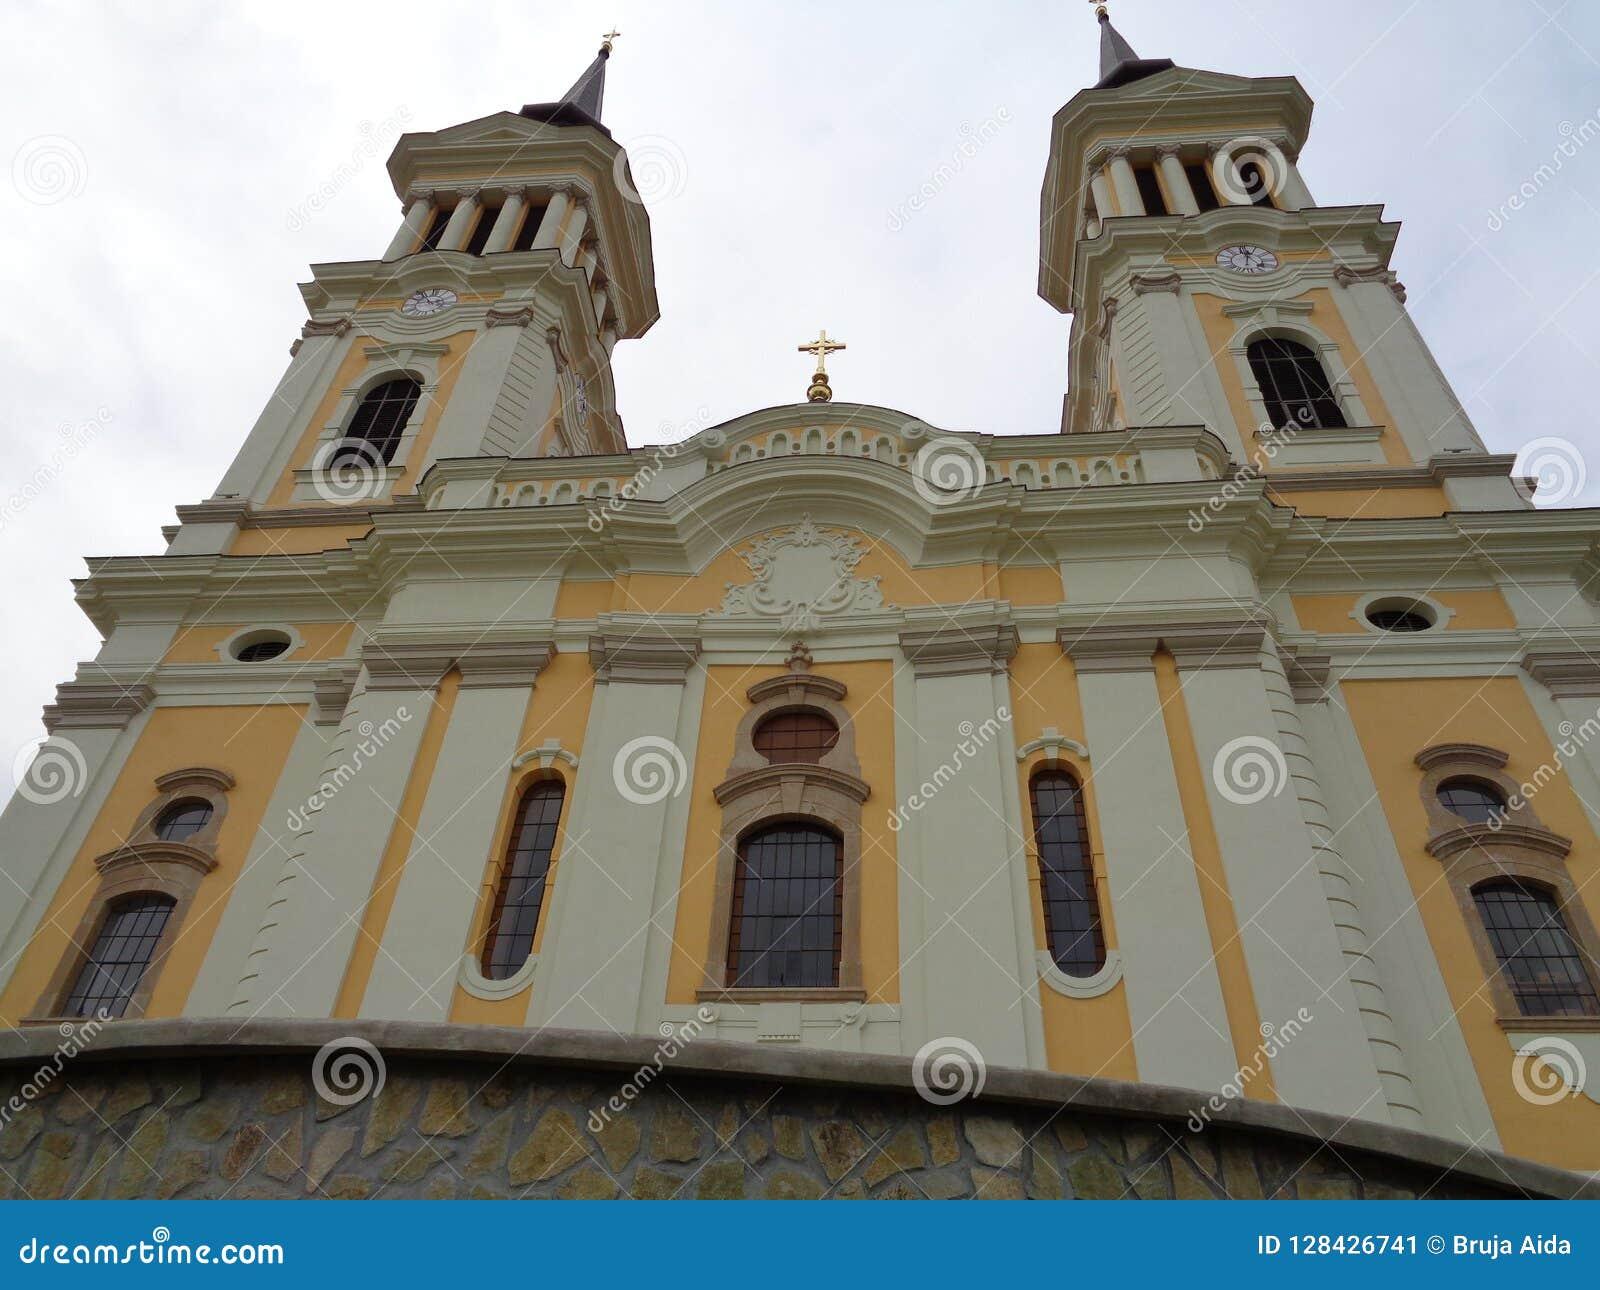 Maria Radna Franciscan Monastery - Rumänien